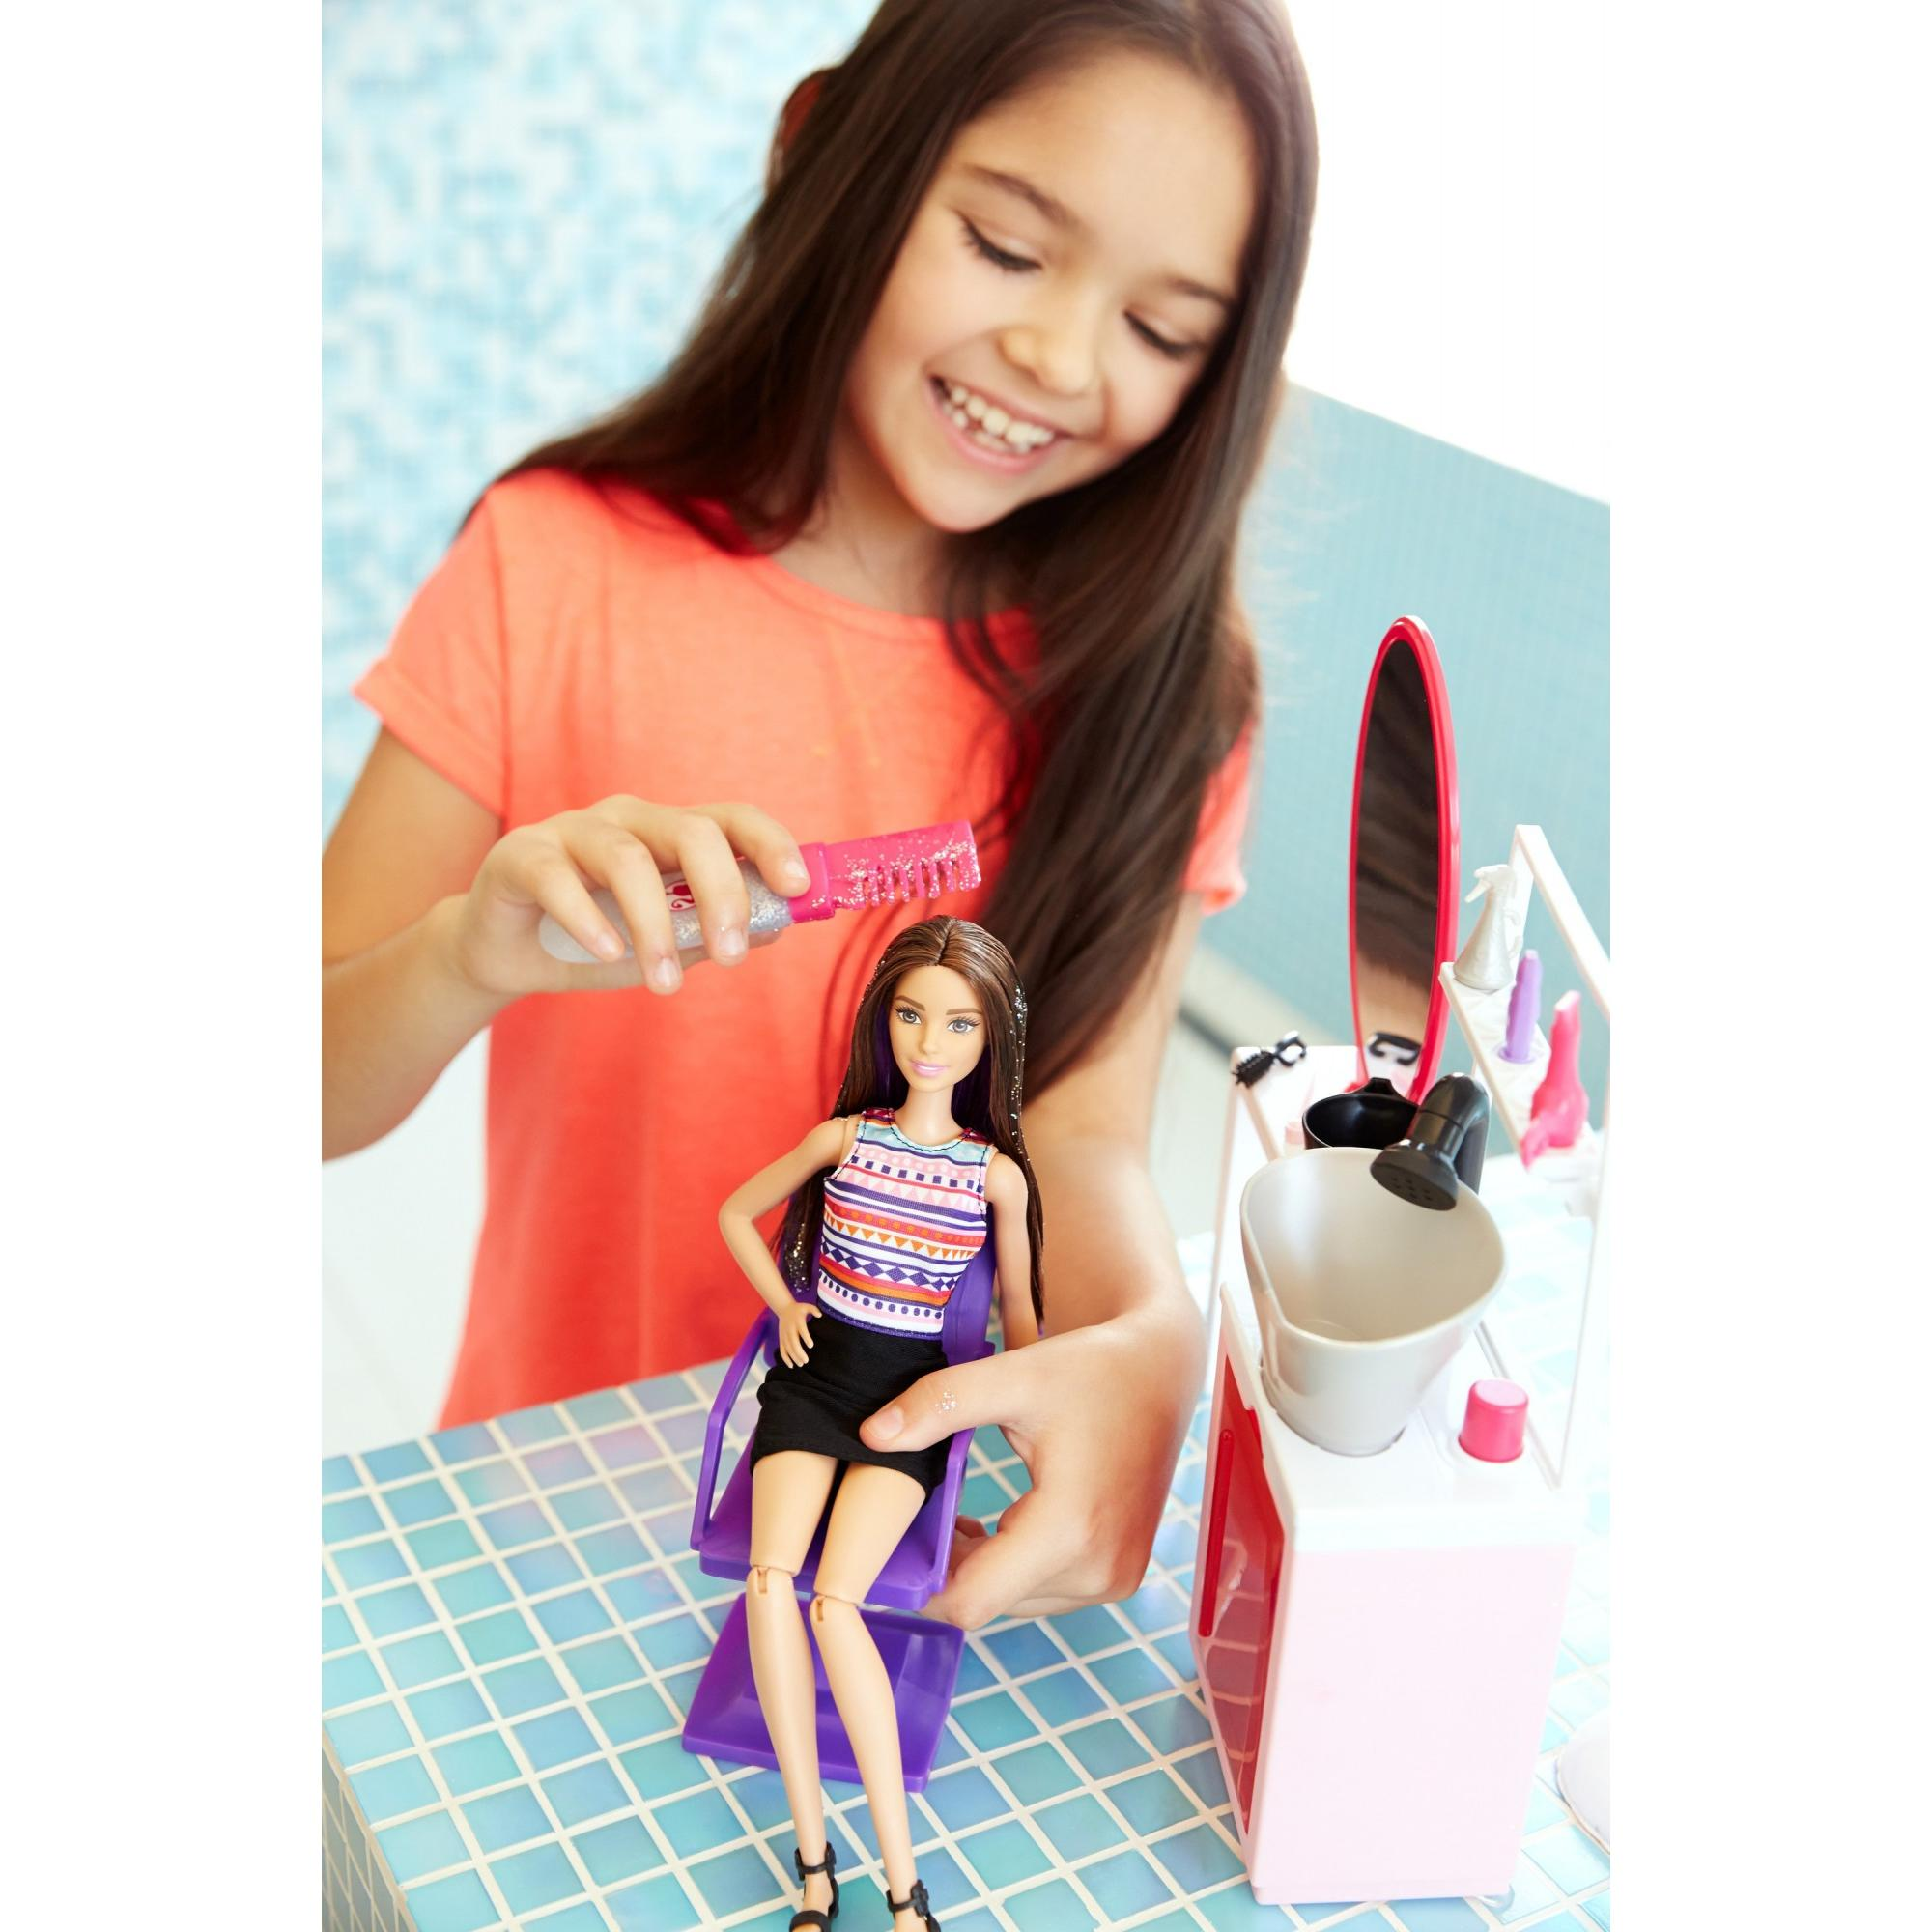 Barbie Sparkle Style Salon Doll & Playset Brunette by MATTEL INC.